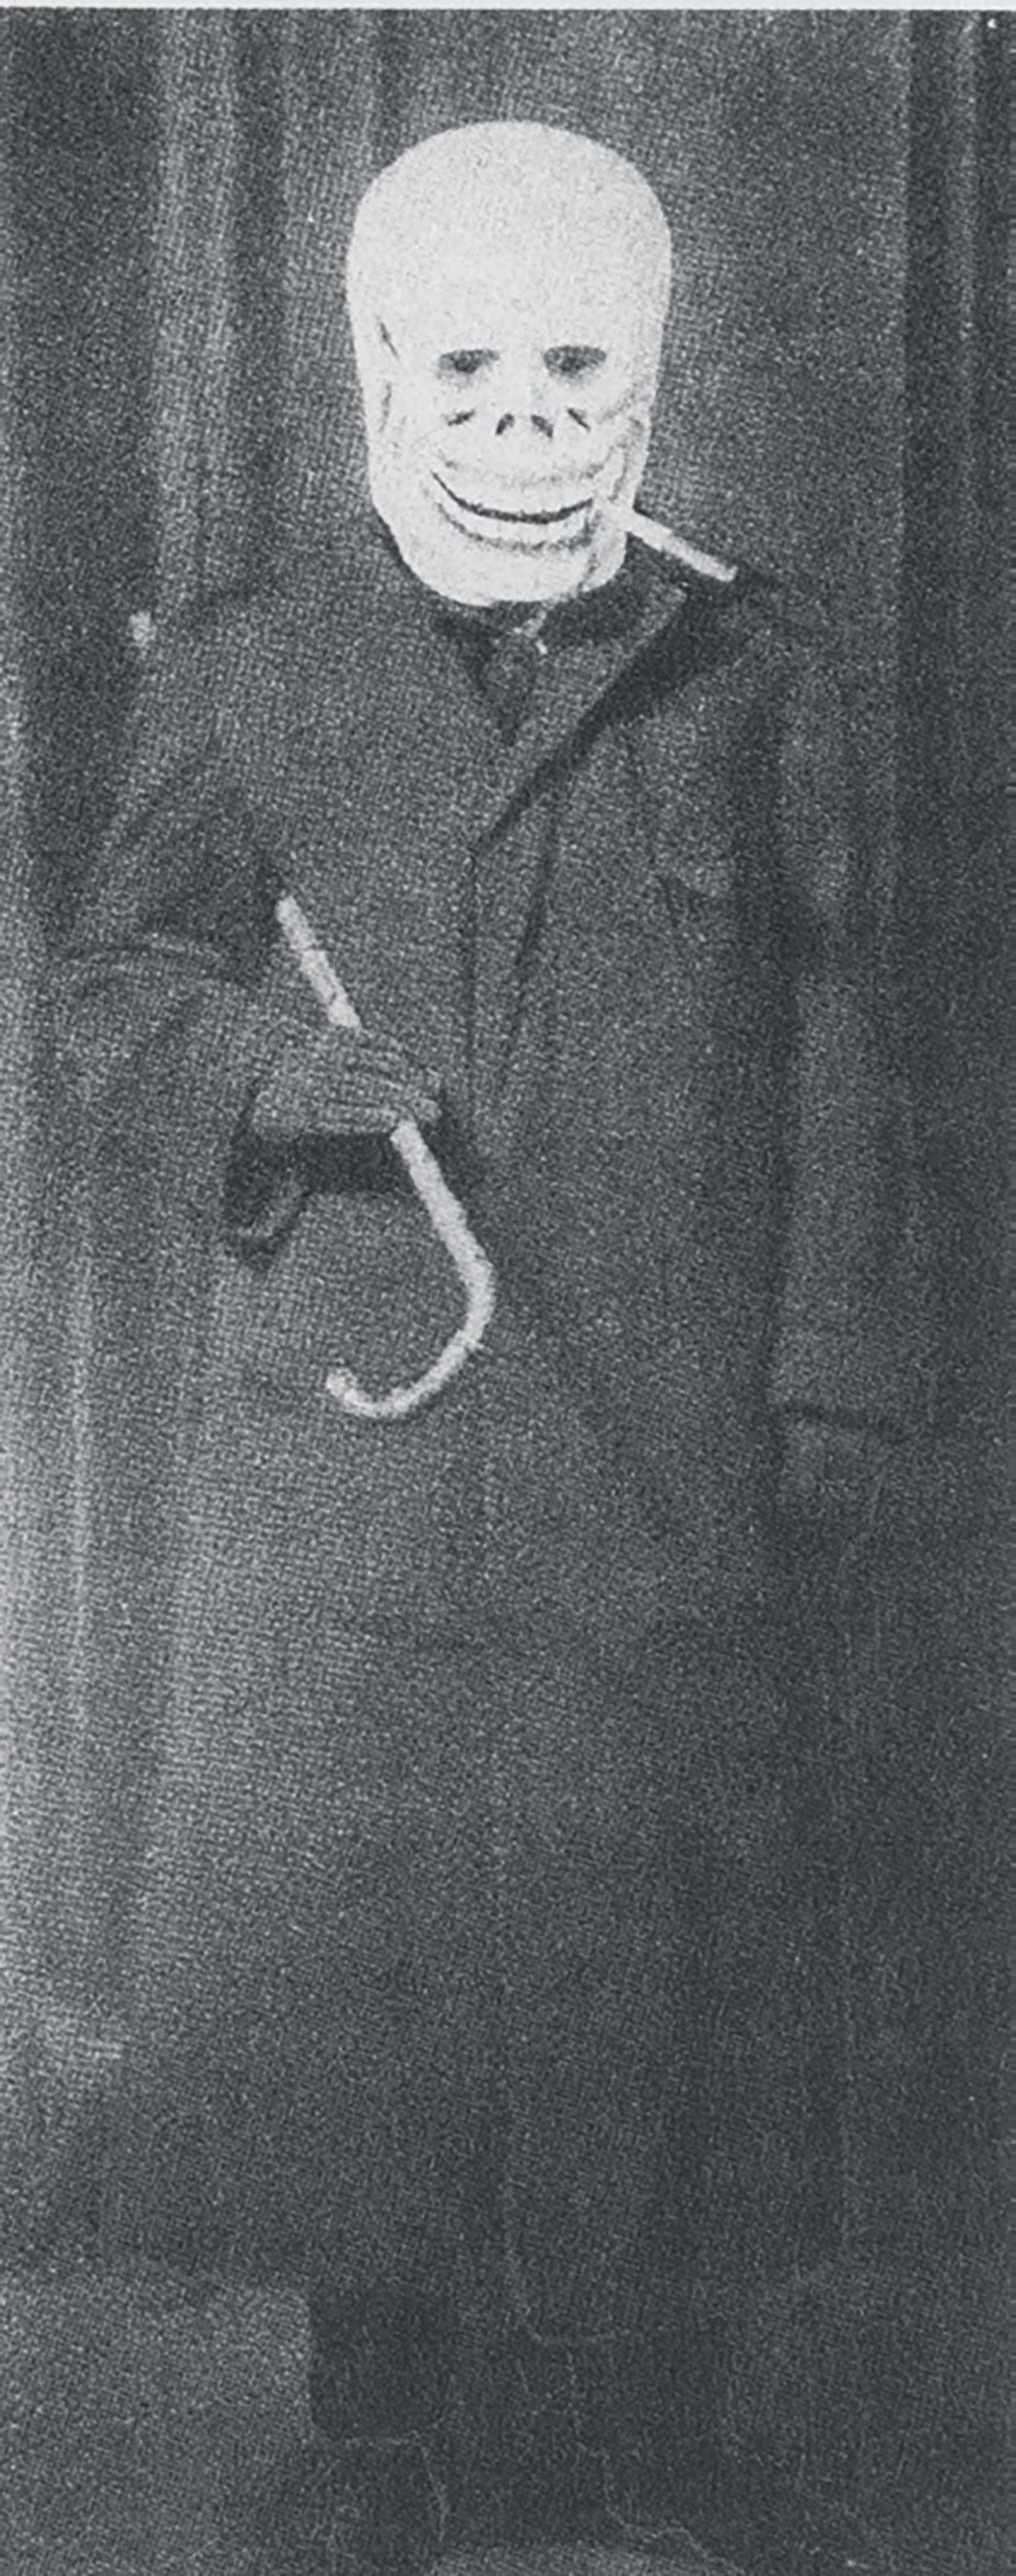 George Grosz & Nazi monsters